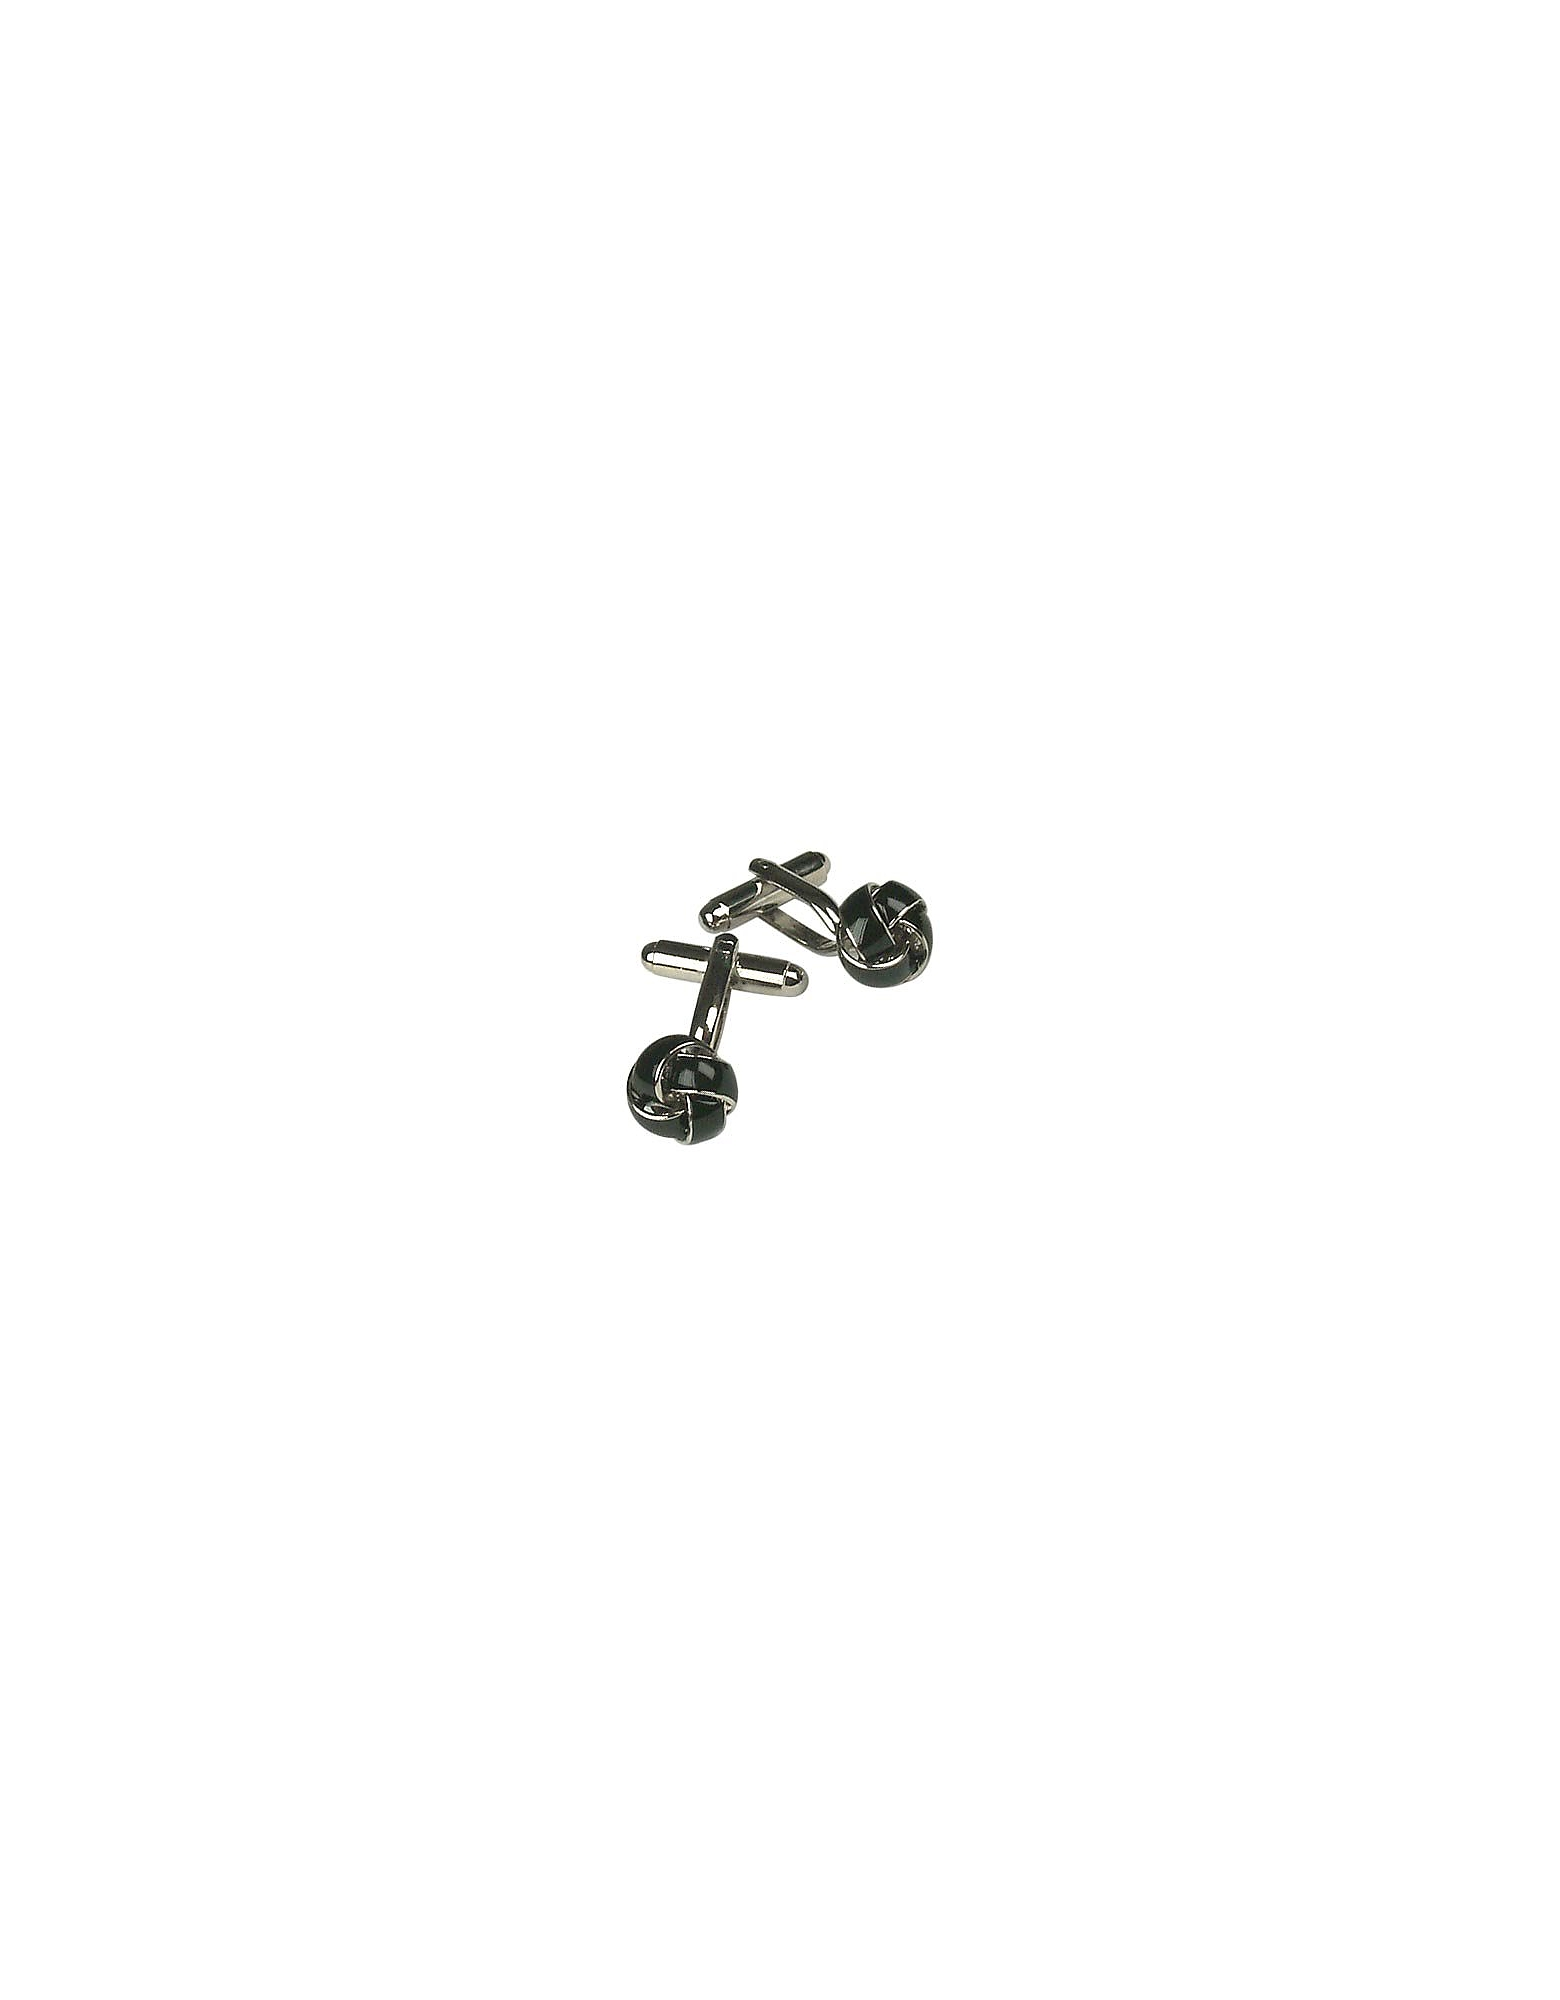 Forzieri Cufflinks, Tresse - Silver Plated Black Knot Cufflinks